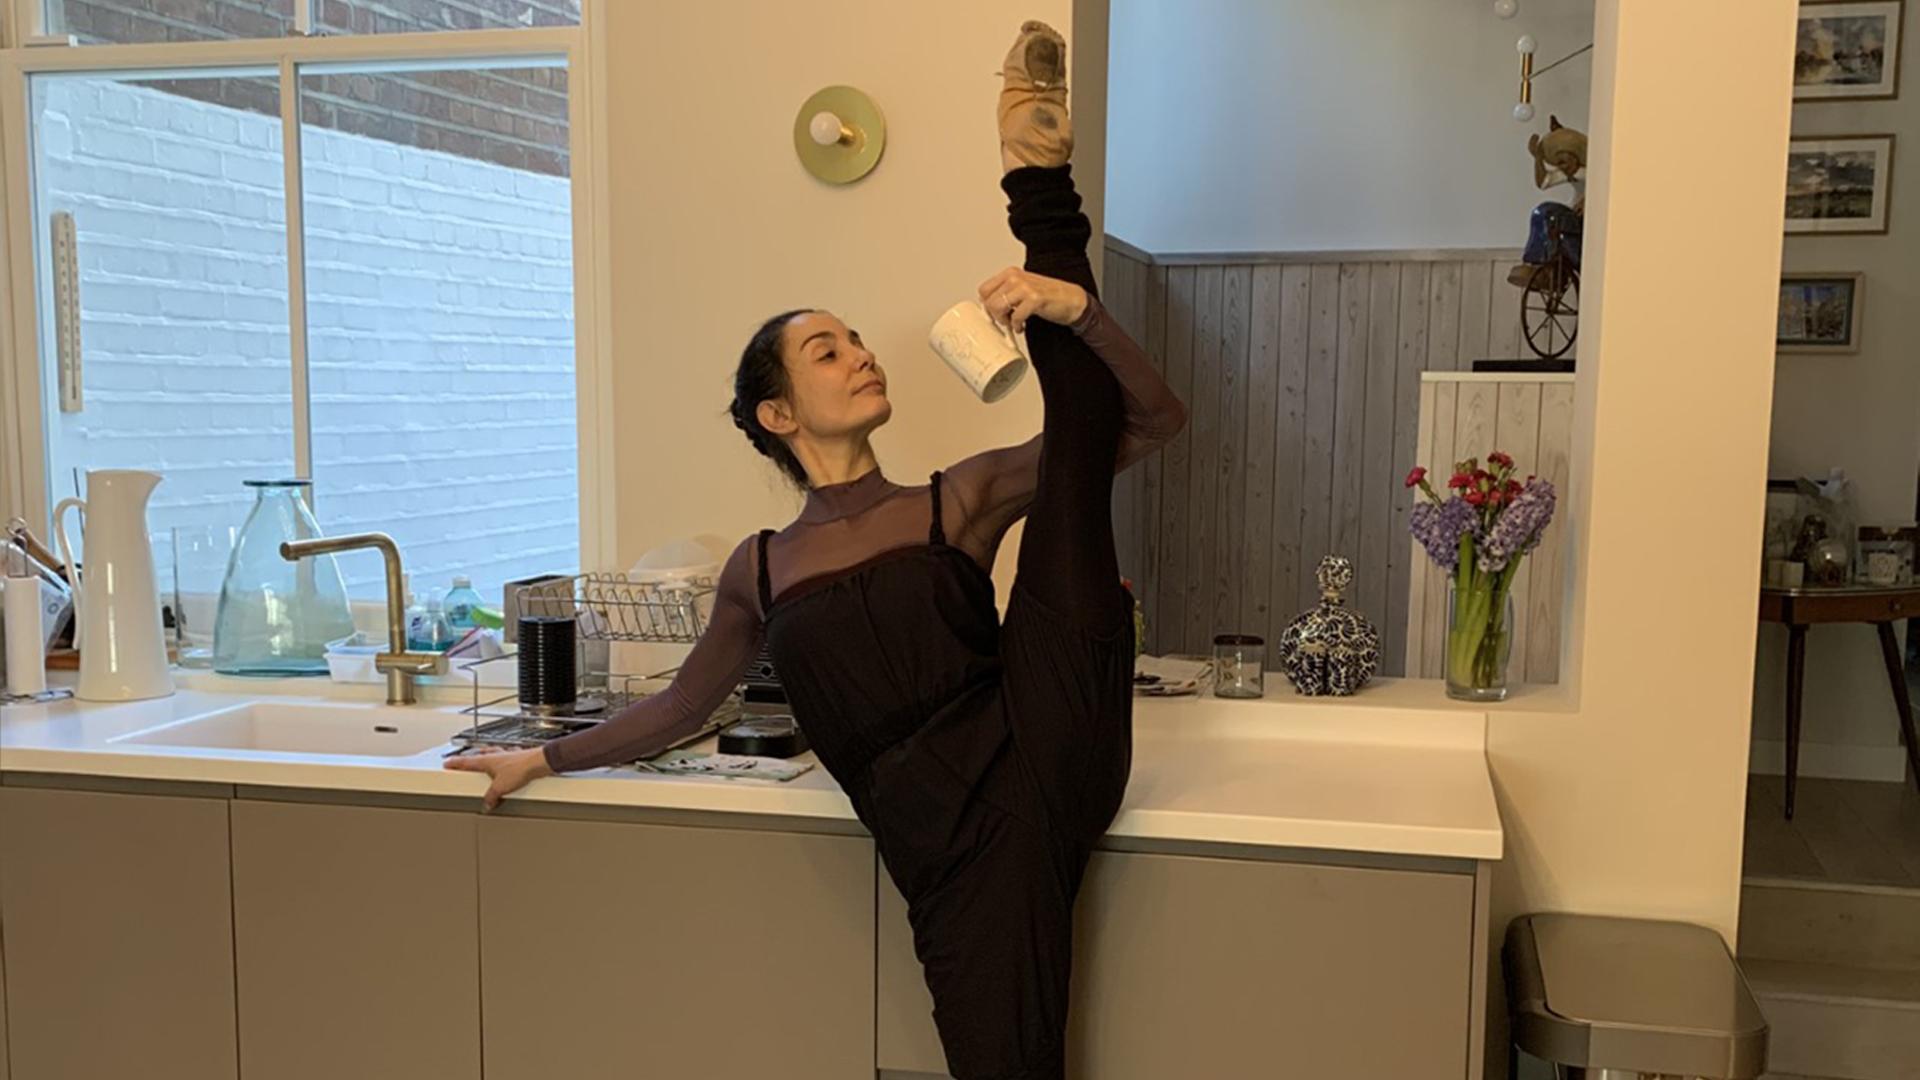 Ballet Class with Tamara Rojo #5 | English National Ballet